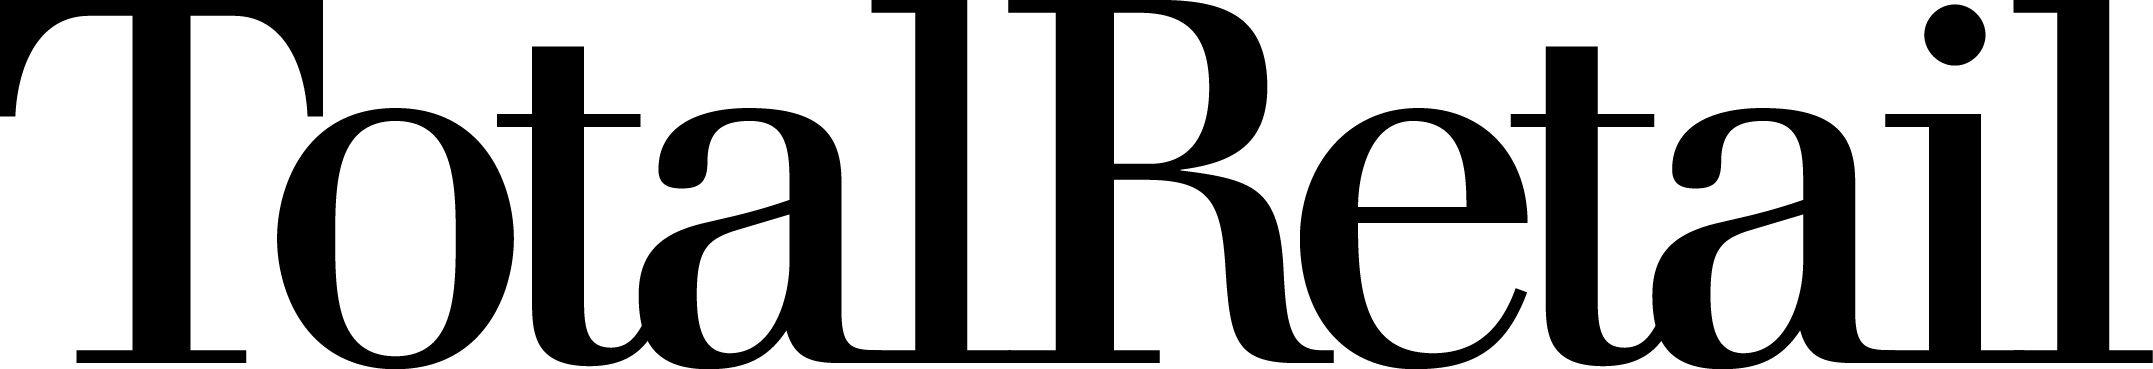 TotalRetail Logo